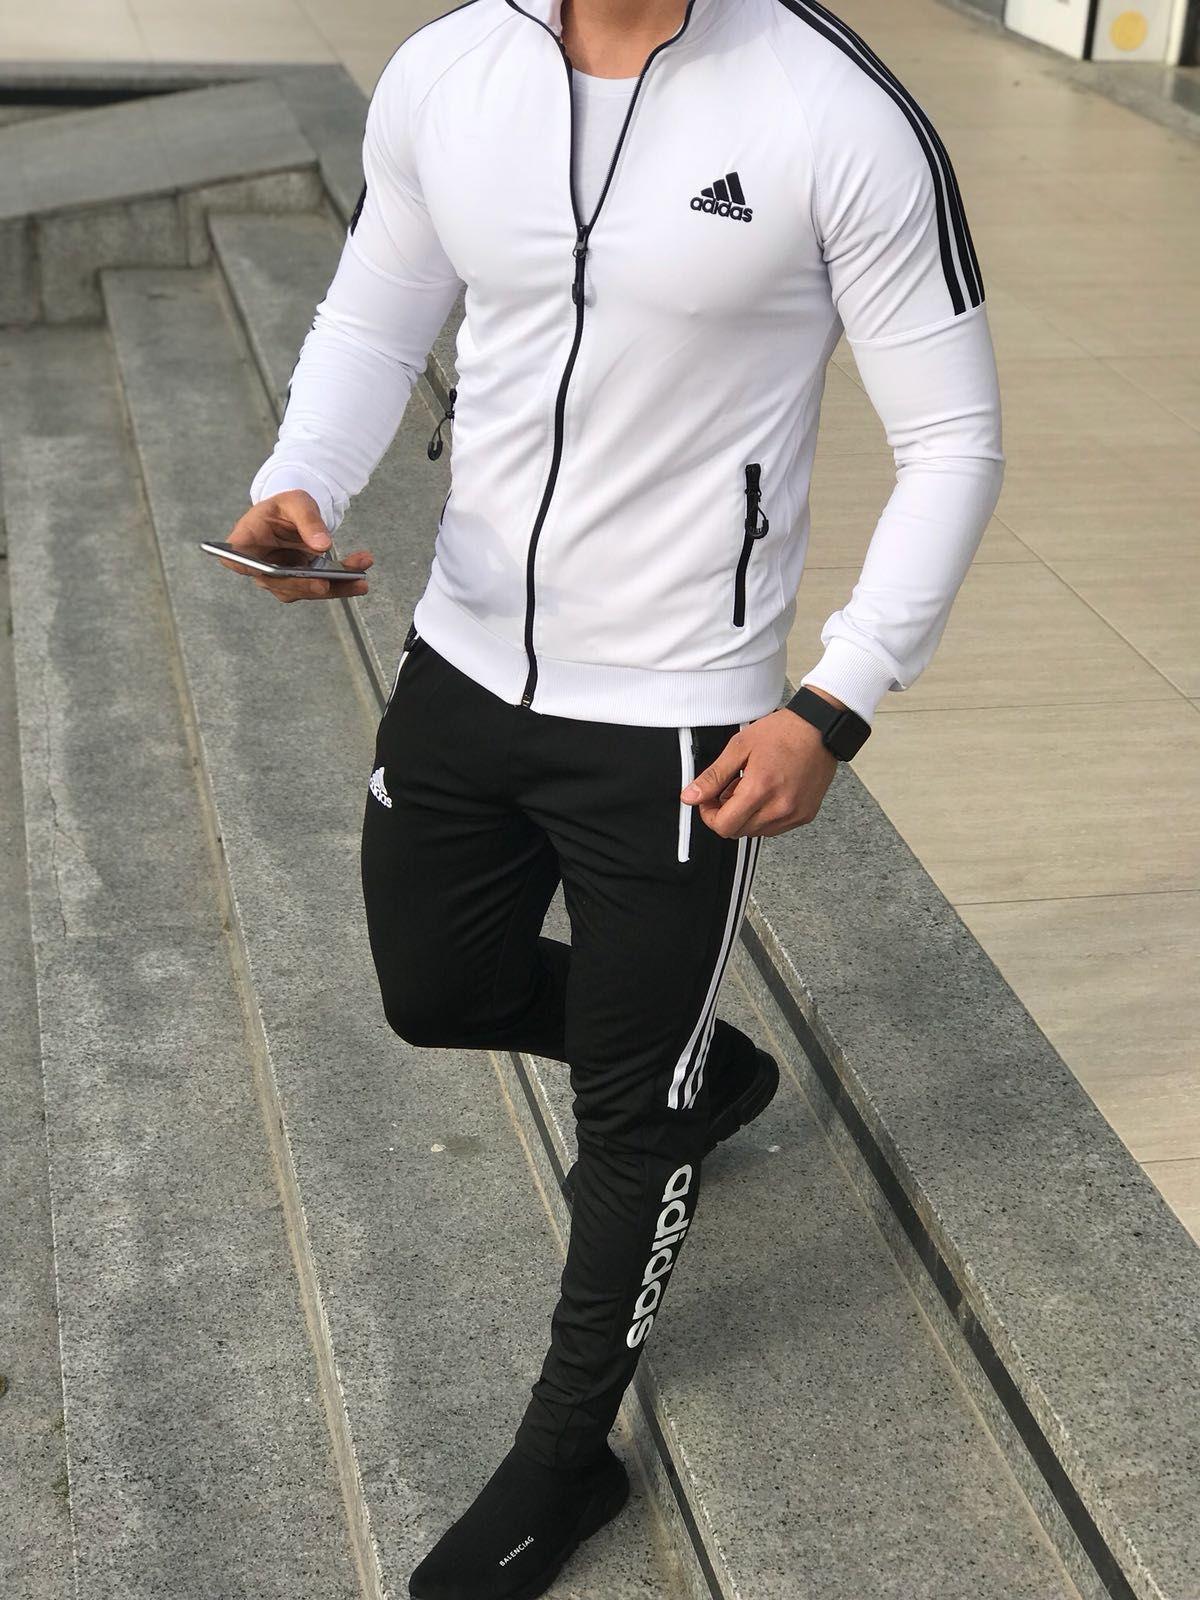 adidas Eşofman E0304Ropa Adidas Erkek Takımı hombreRopa pqULzMVGS